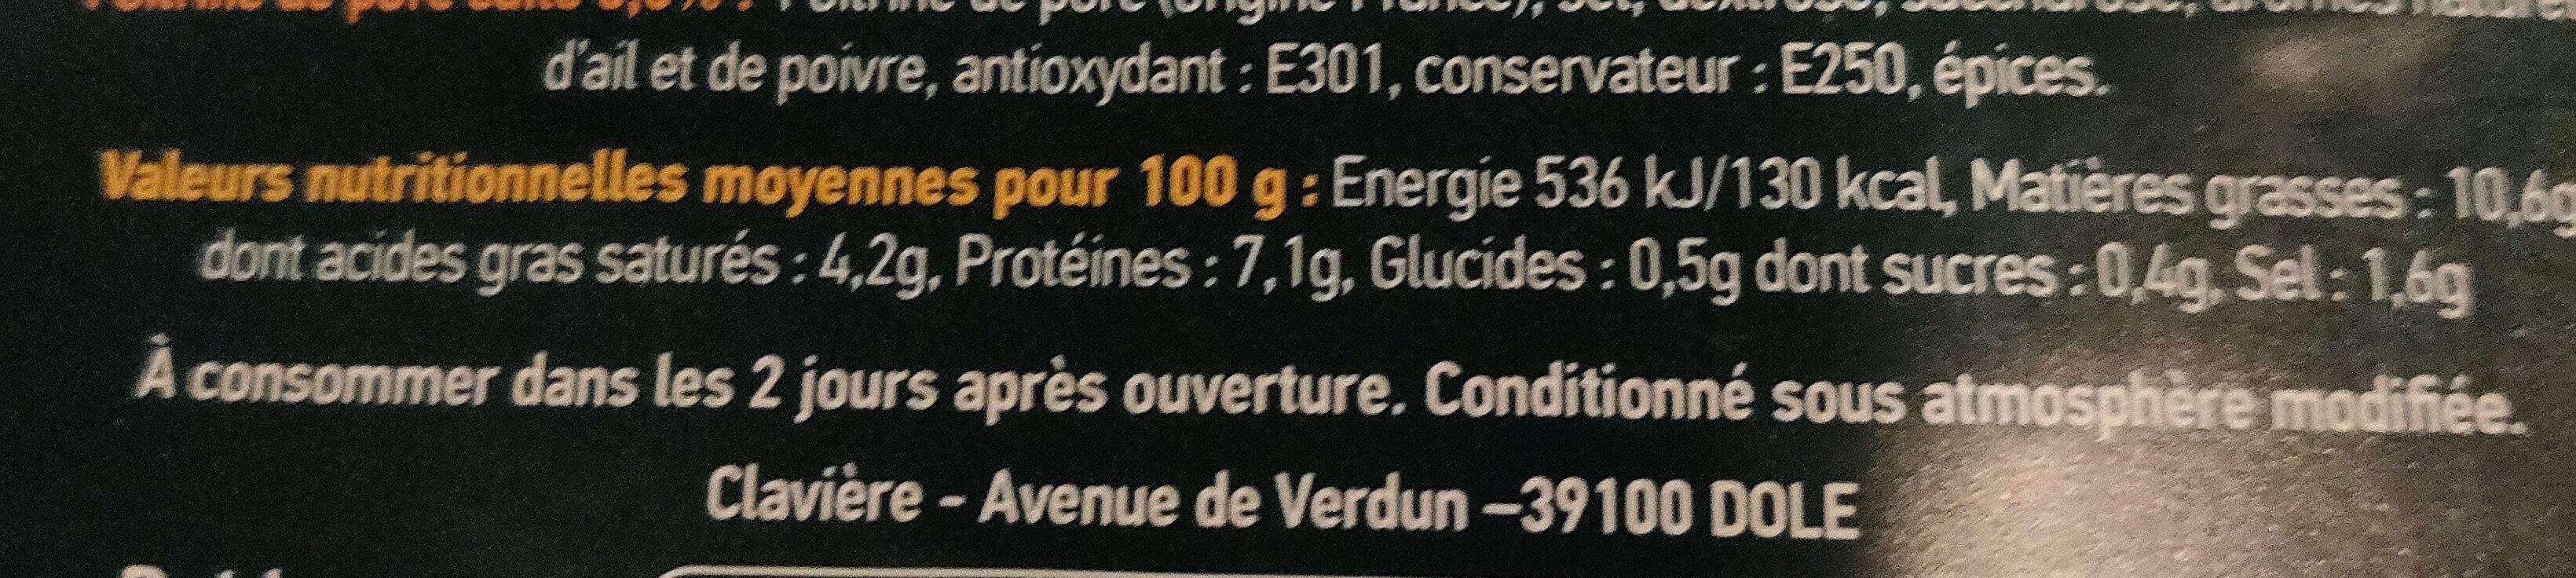 Choucroute cuite garnie - Ingrédients - fr